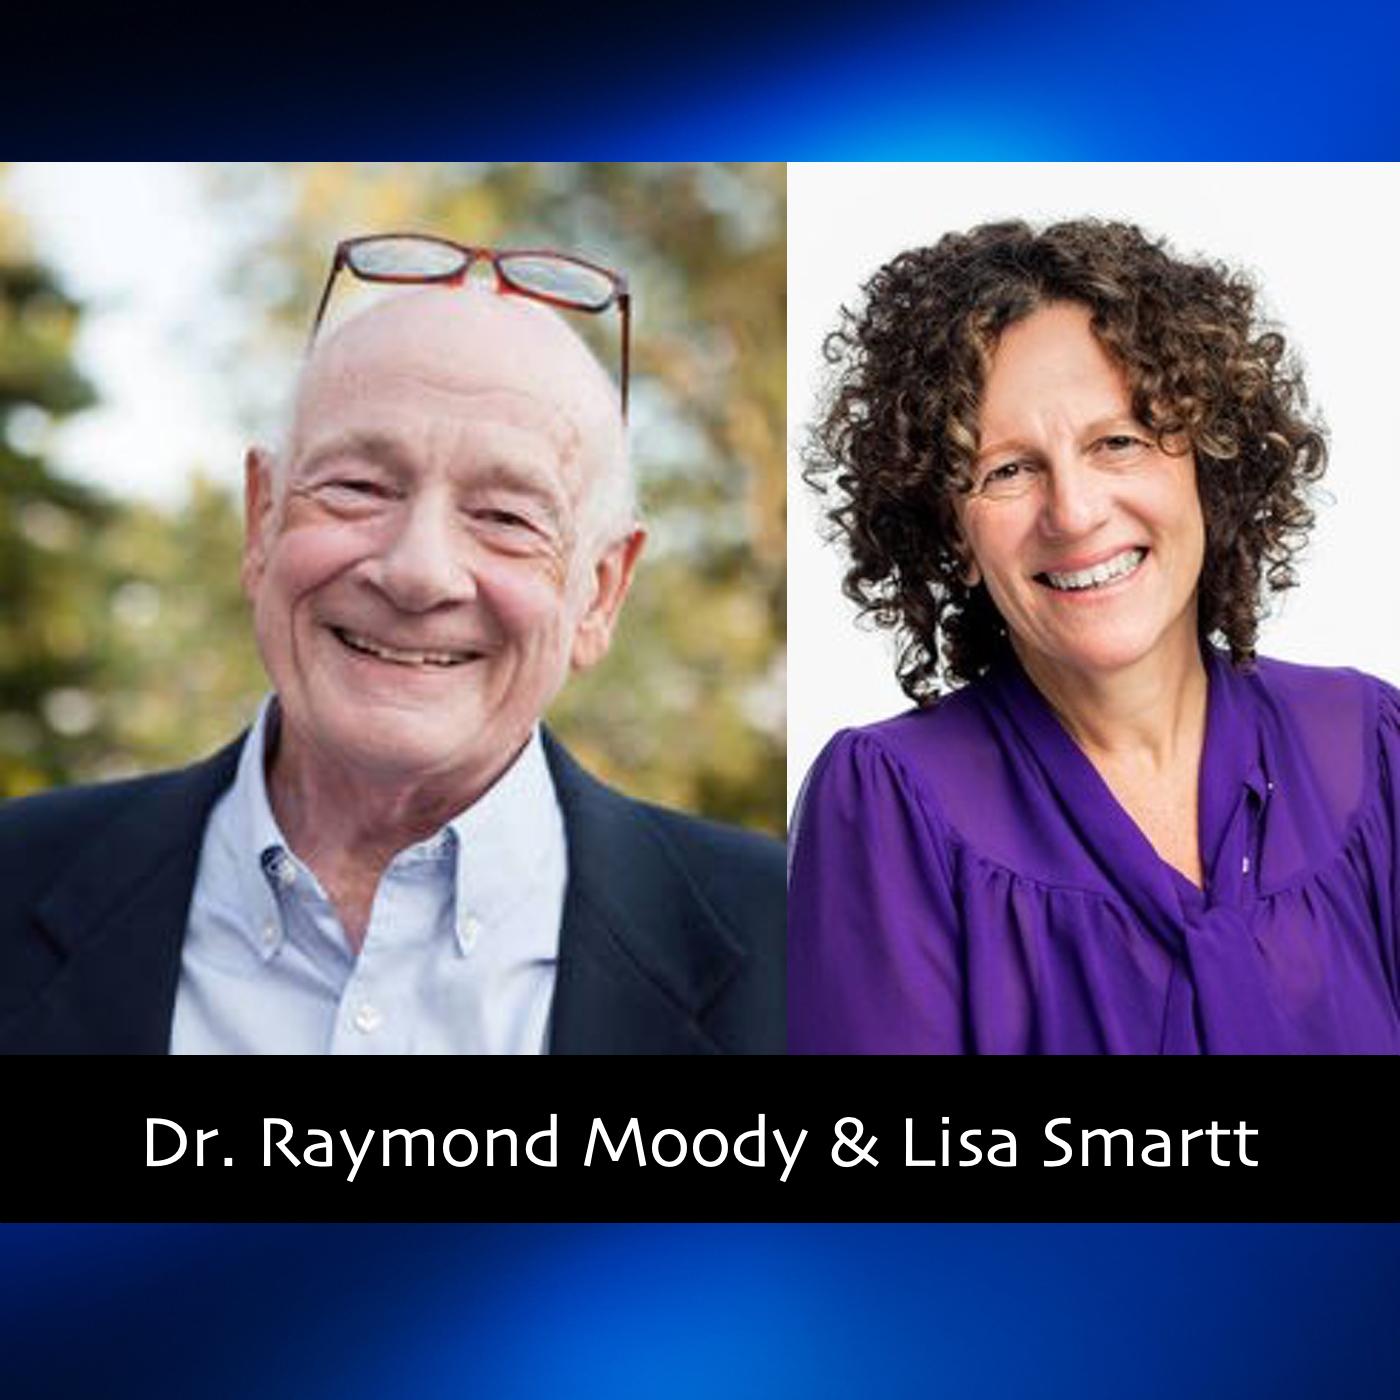 Raymond Moody and Lisa Smartt thumb.jpg